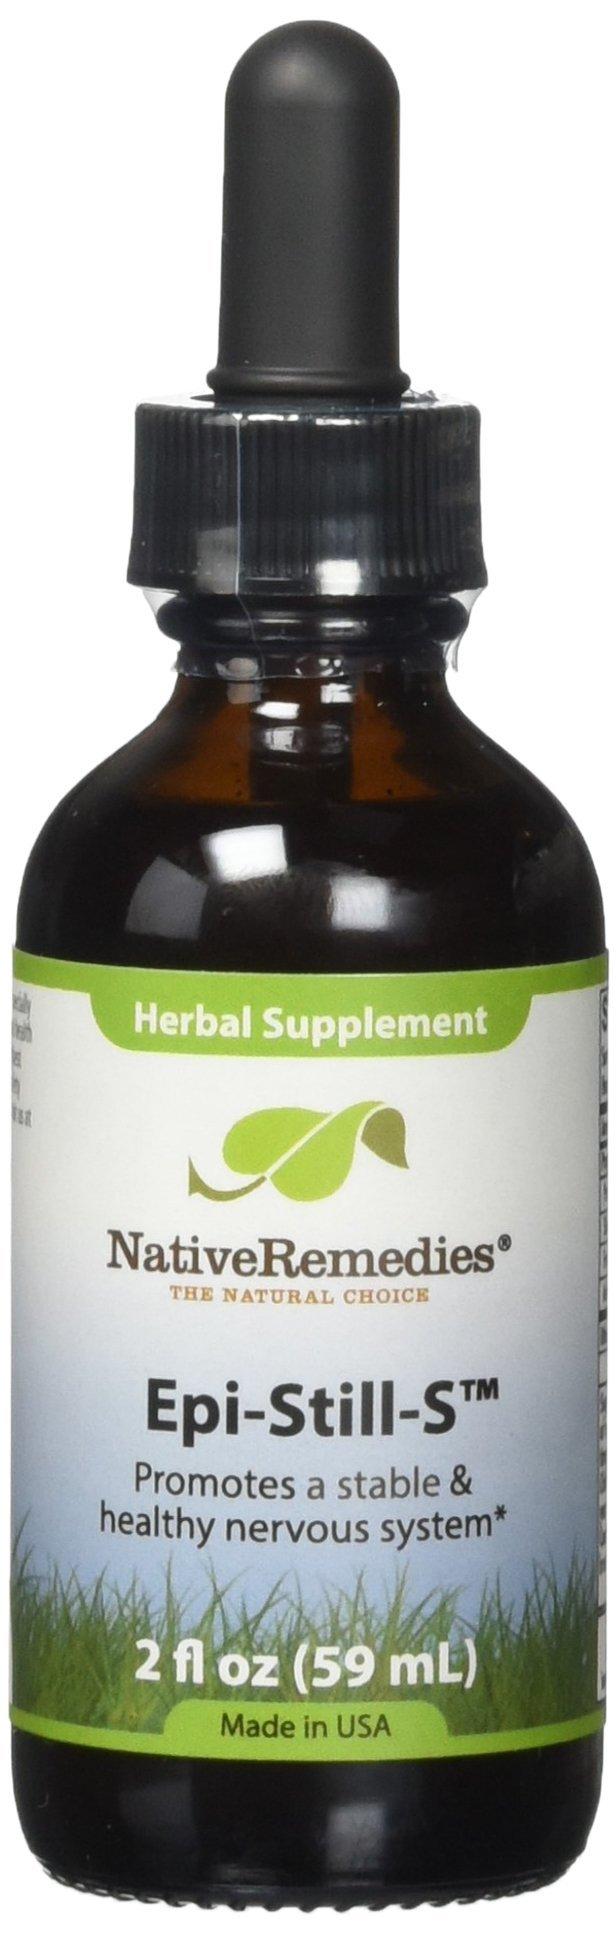 Native Remedies Epi-Still-S